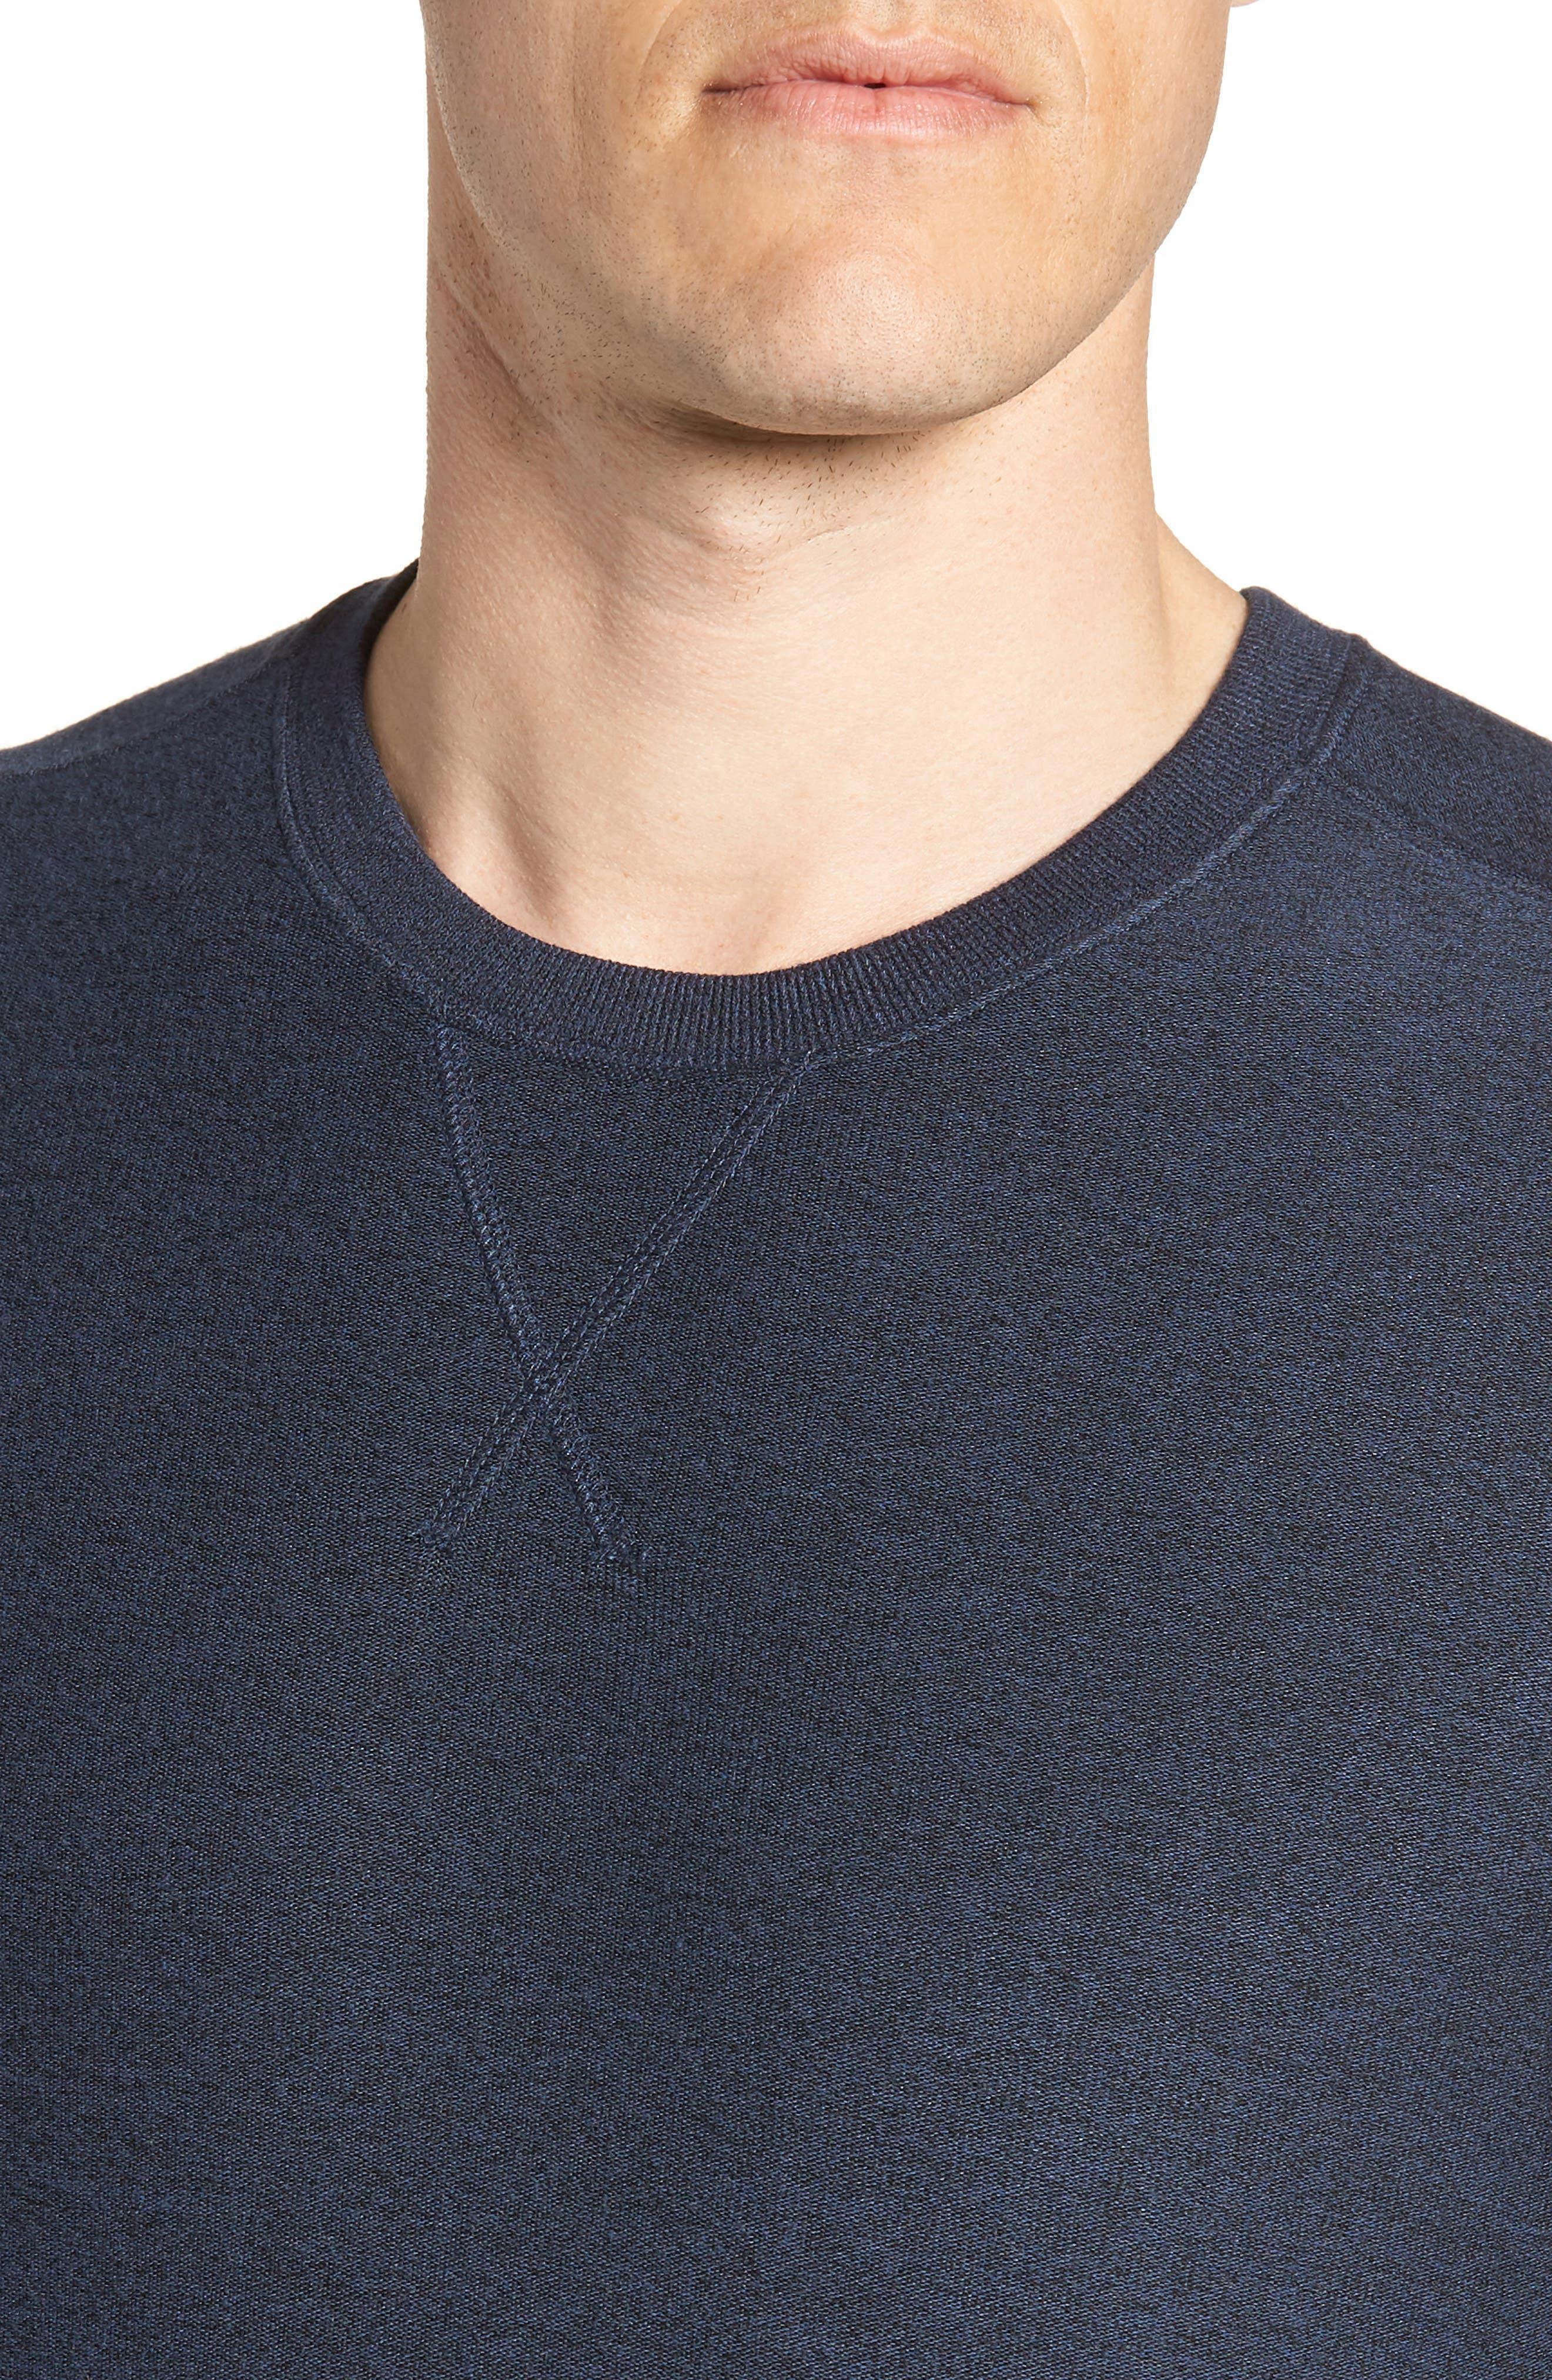 Ultra Soft Crewneck Sweatshirt,                             Alternate thumbnail 4, color,                             Navy Indigo Marl